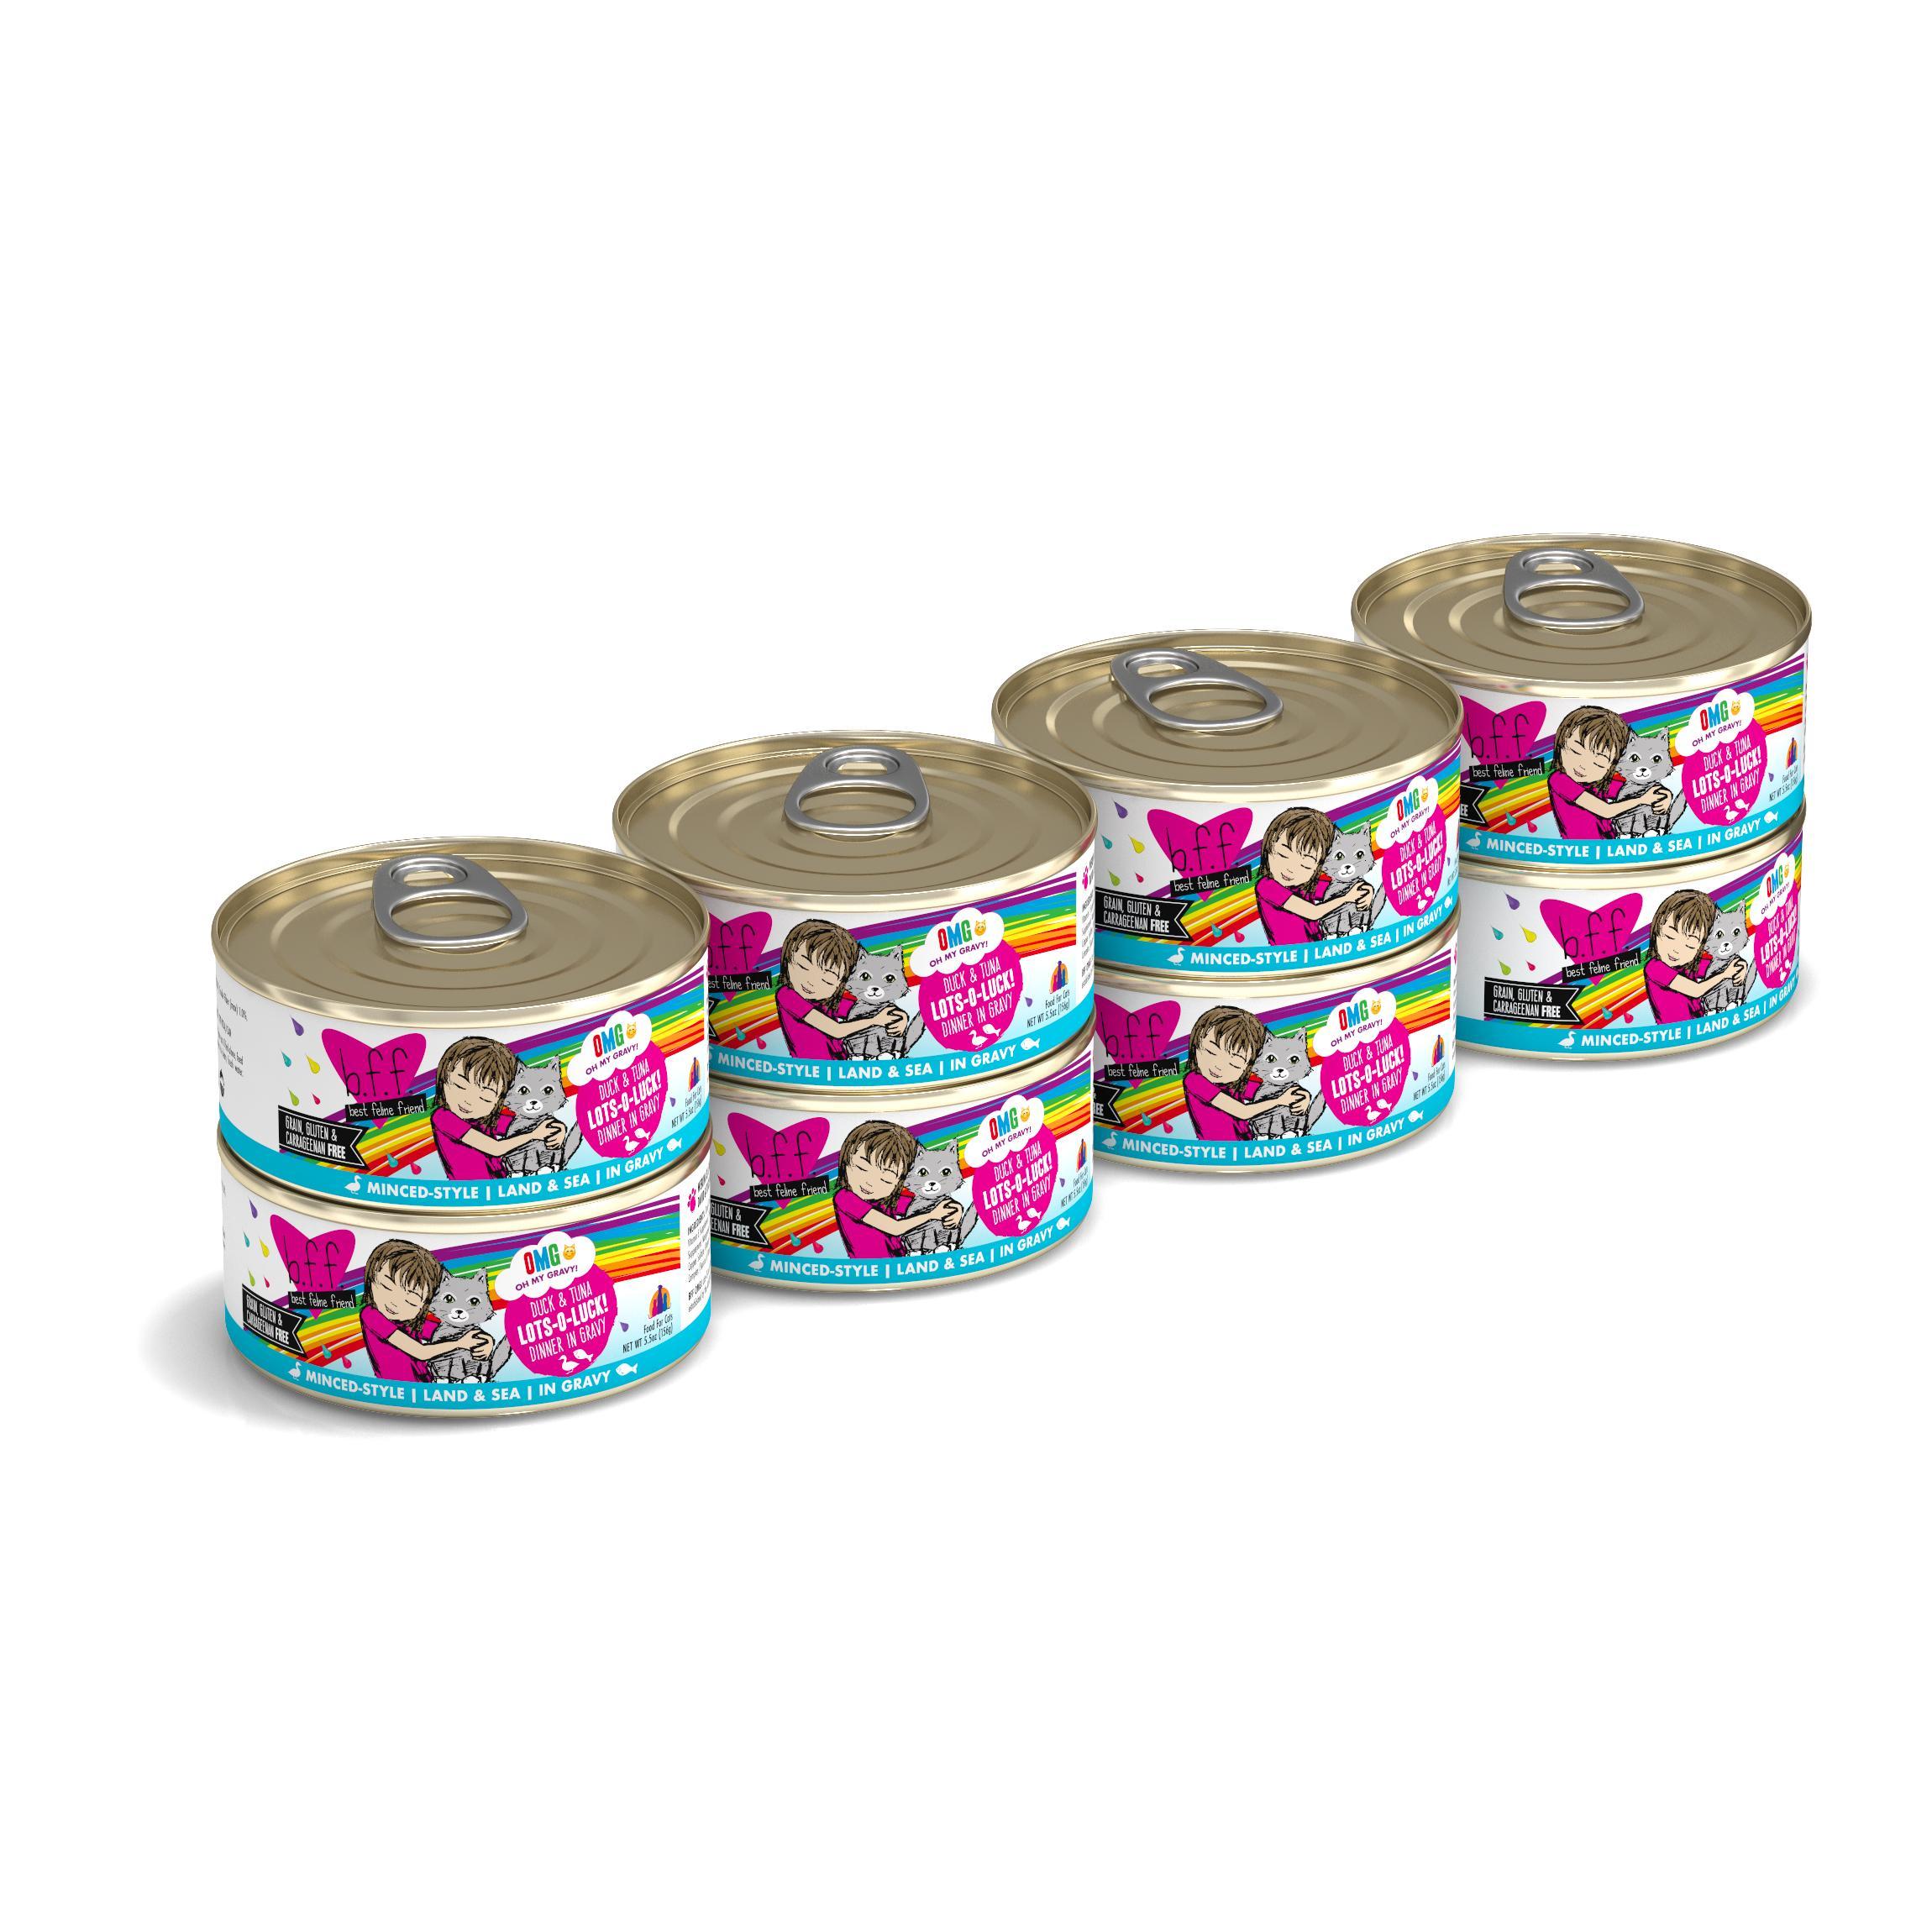 BFF Oh My Gravy! Lots-O-Luck! Duck & Tuna Dinner in Gravy Grain-Free Wet Cat Food, 5.5-oz, case of 8